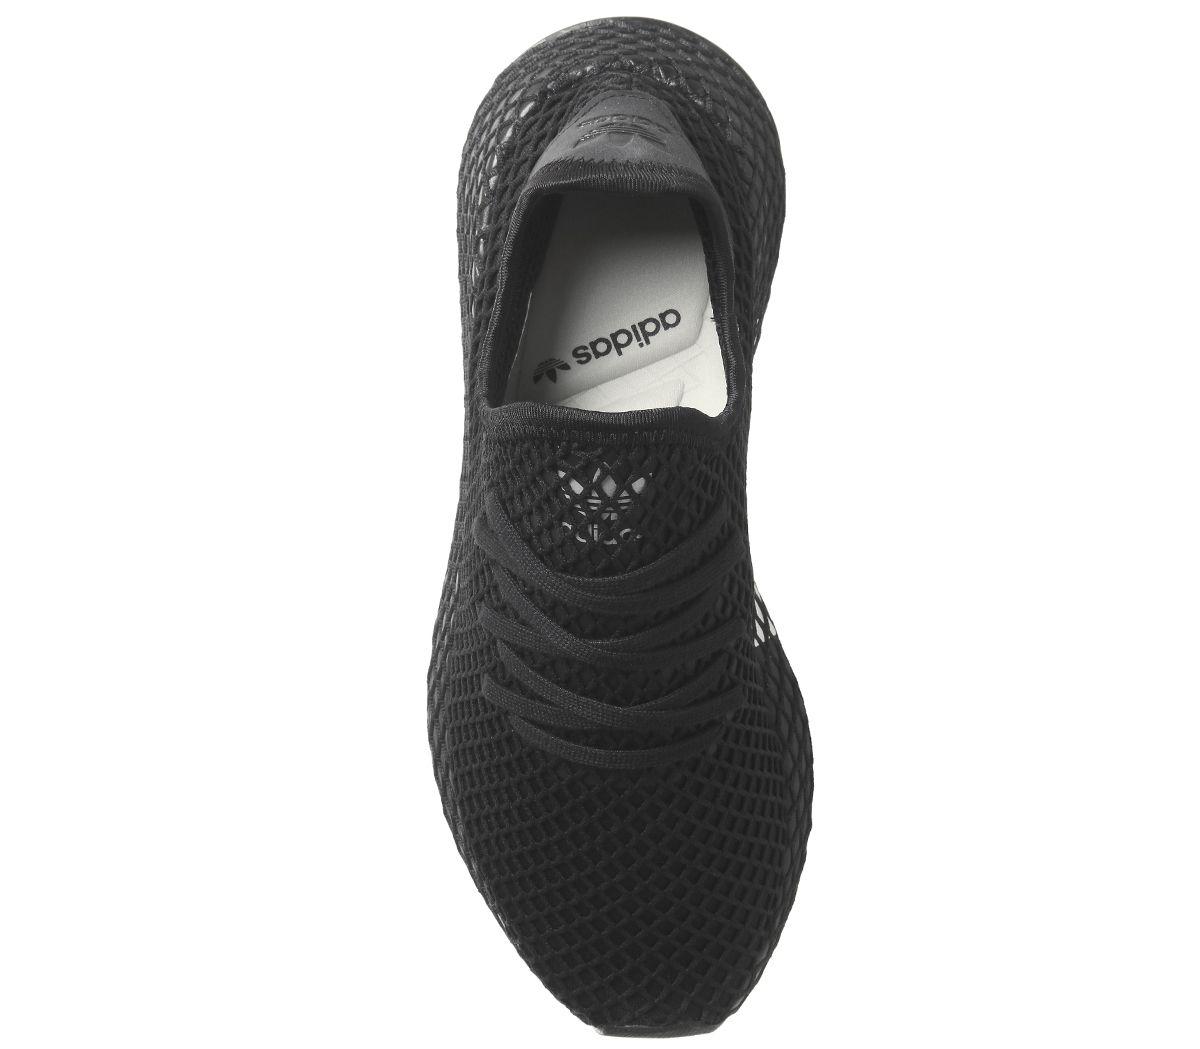 f0d40cb54 Mens Adidas Deerupt Trainers Core Black Core Black Trainers Shoes